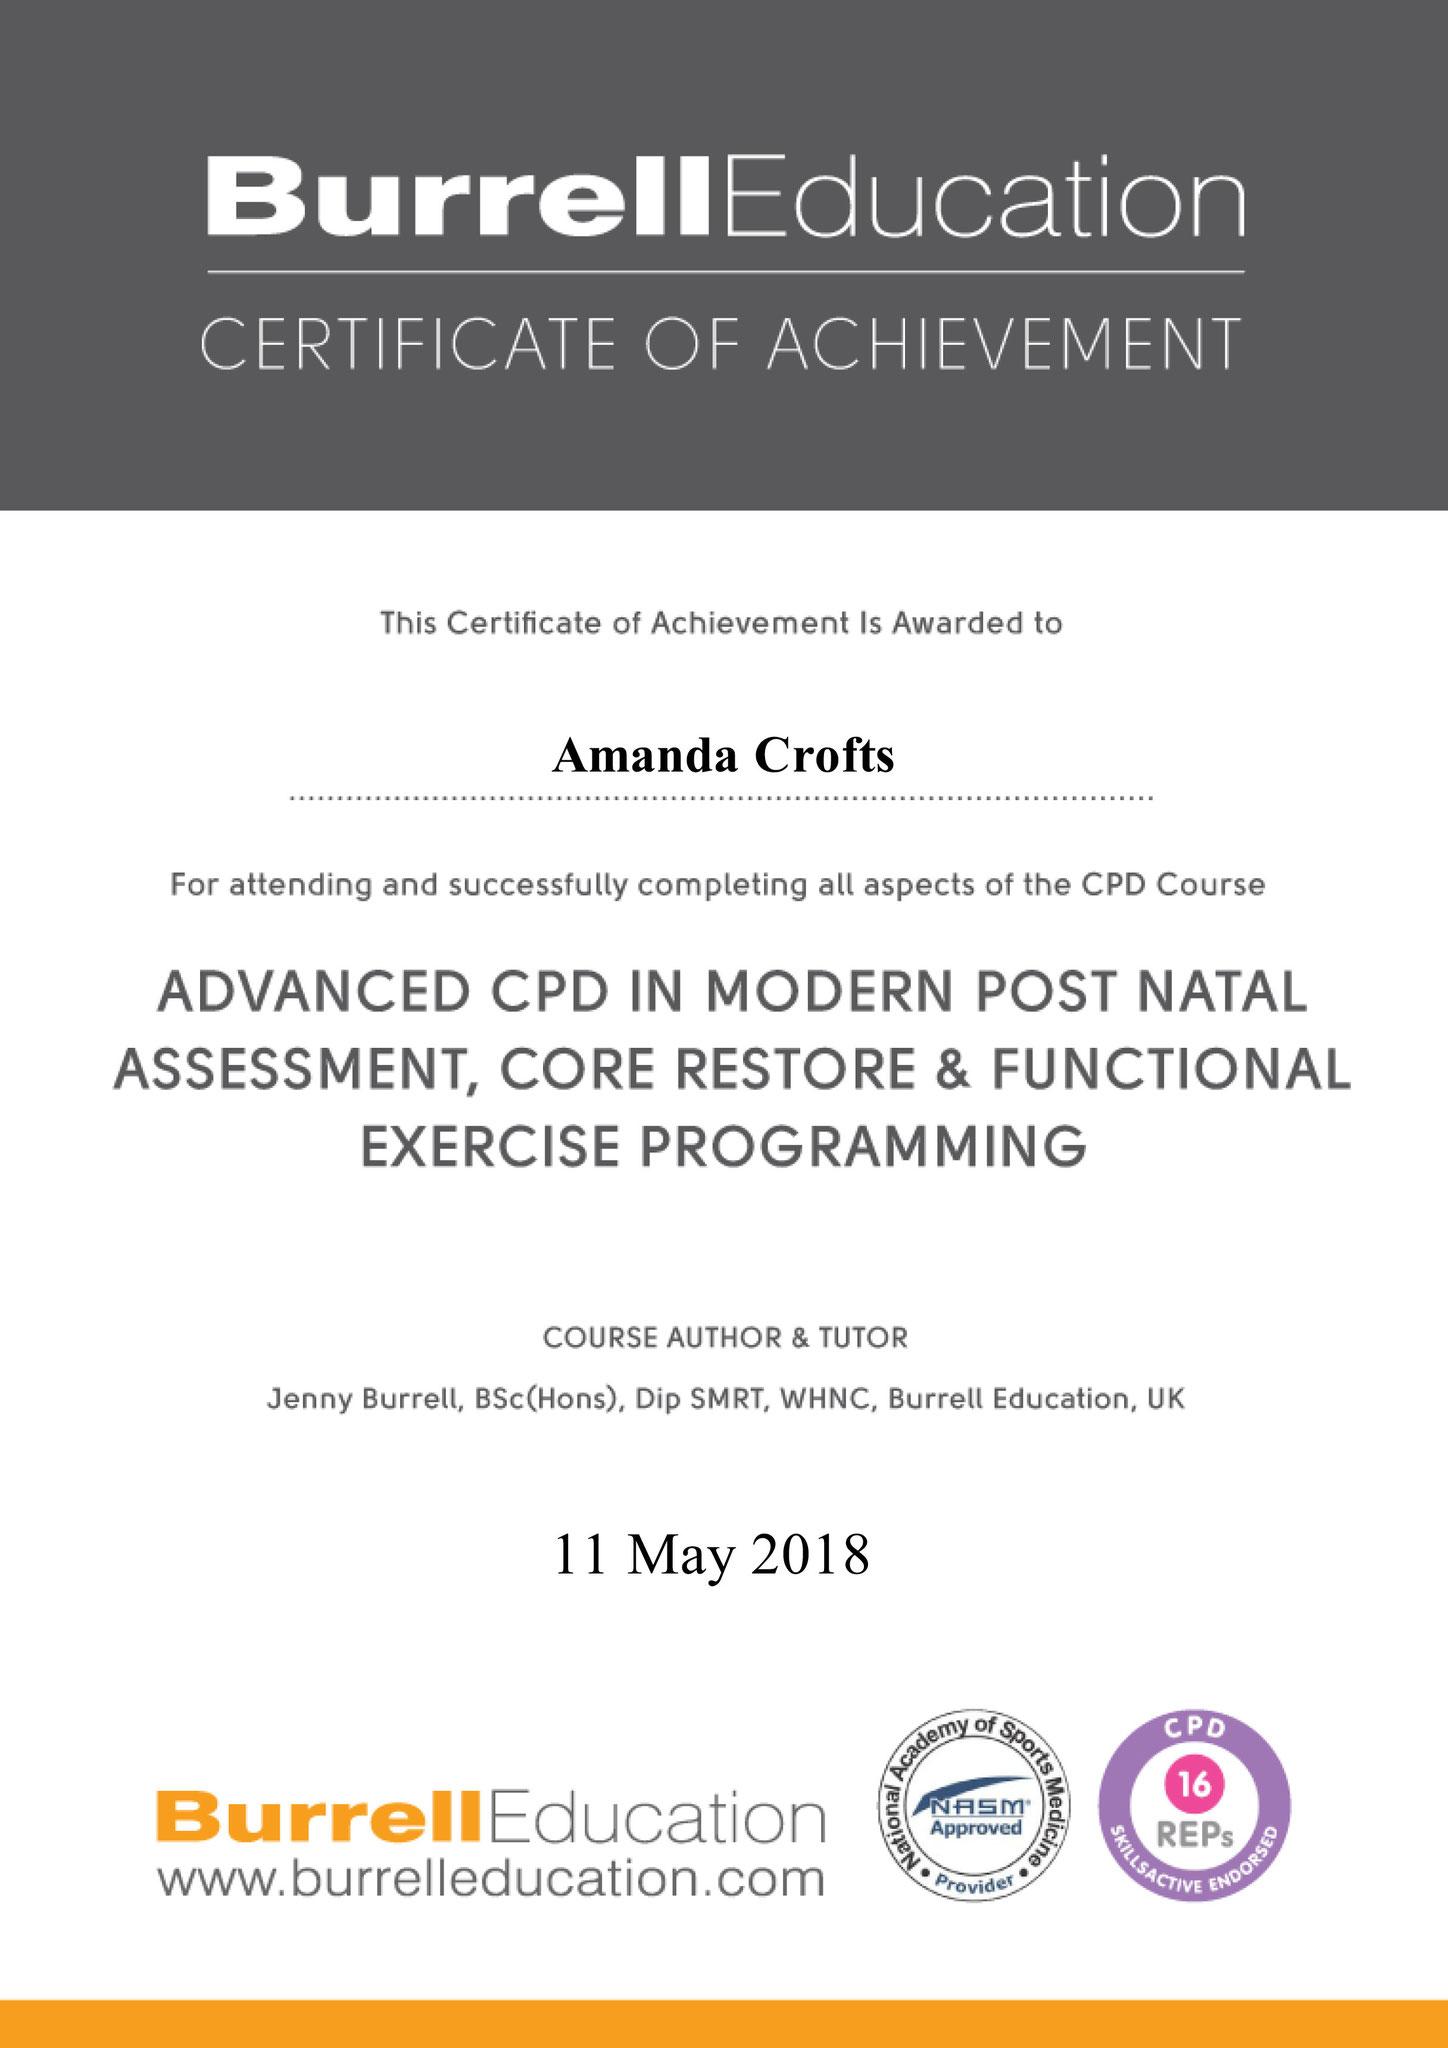 Burrell Education Modern Postnatal Core Restore Certificate